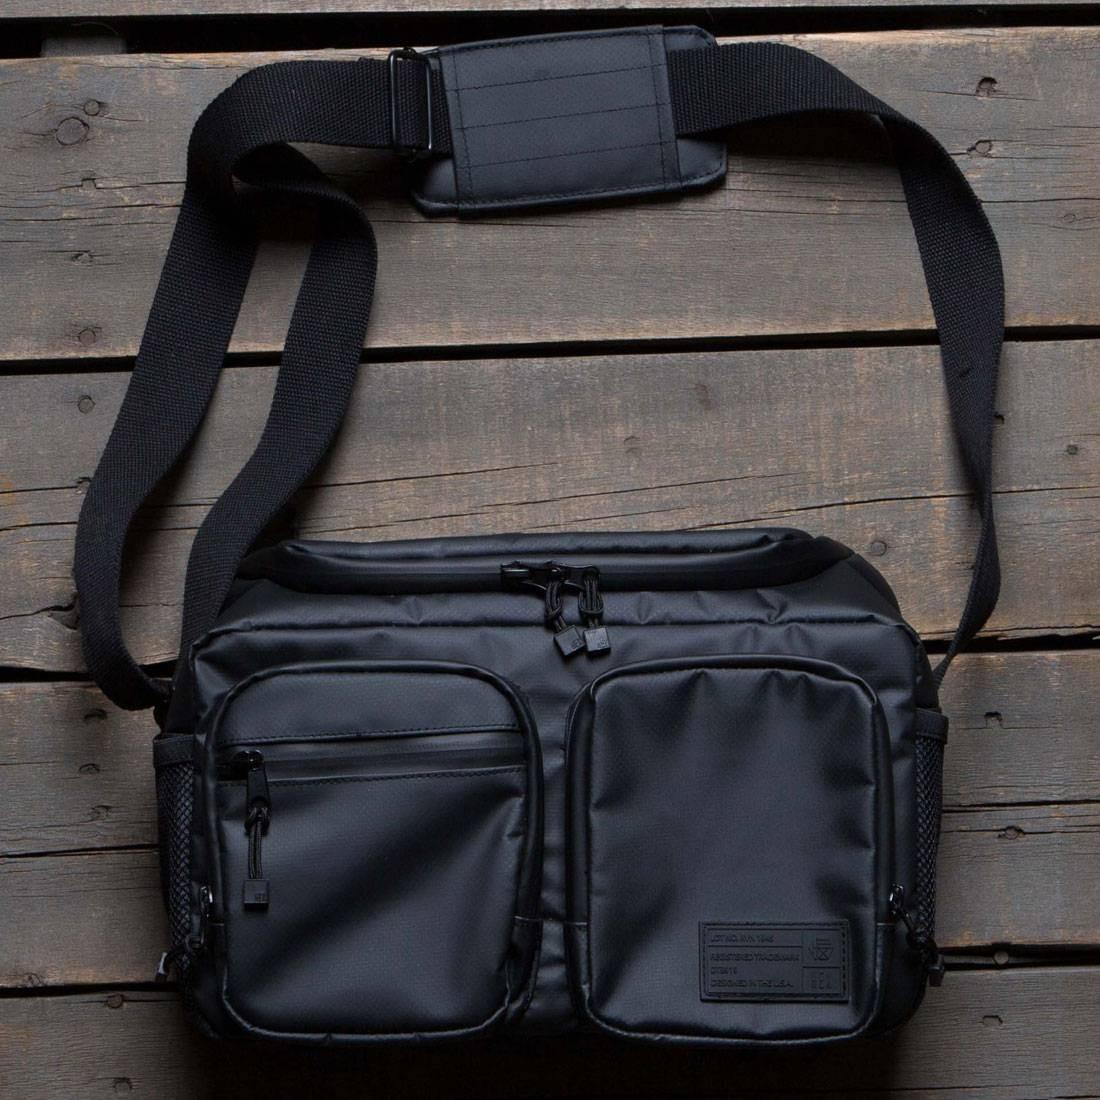 Hex Mirrorless Camera Bag (black / matte)